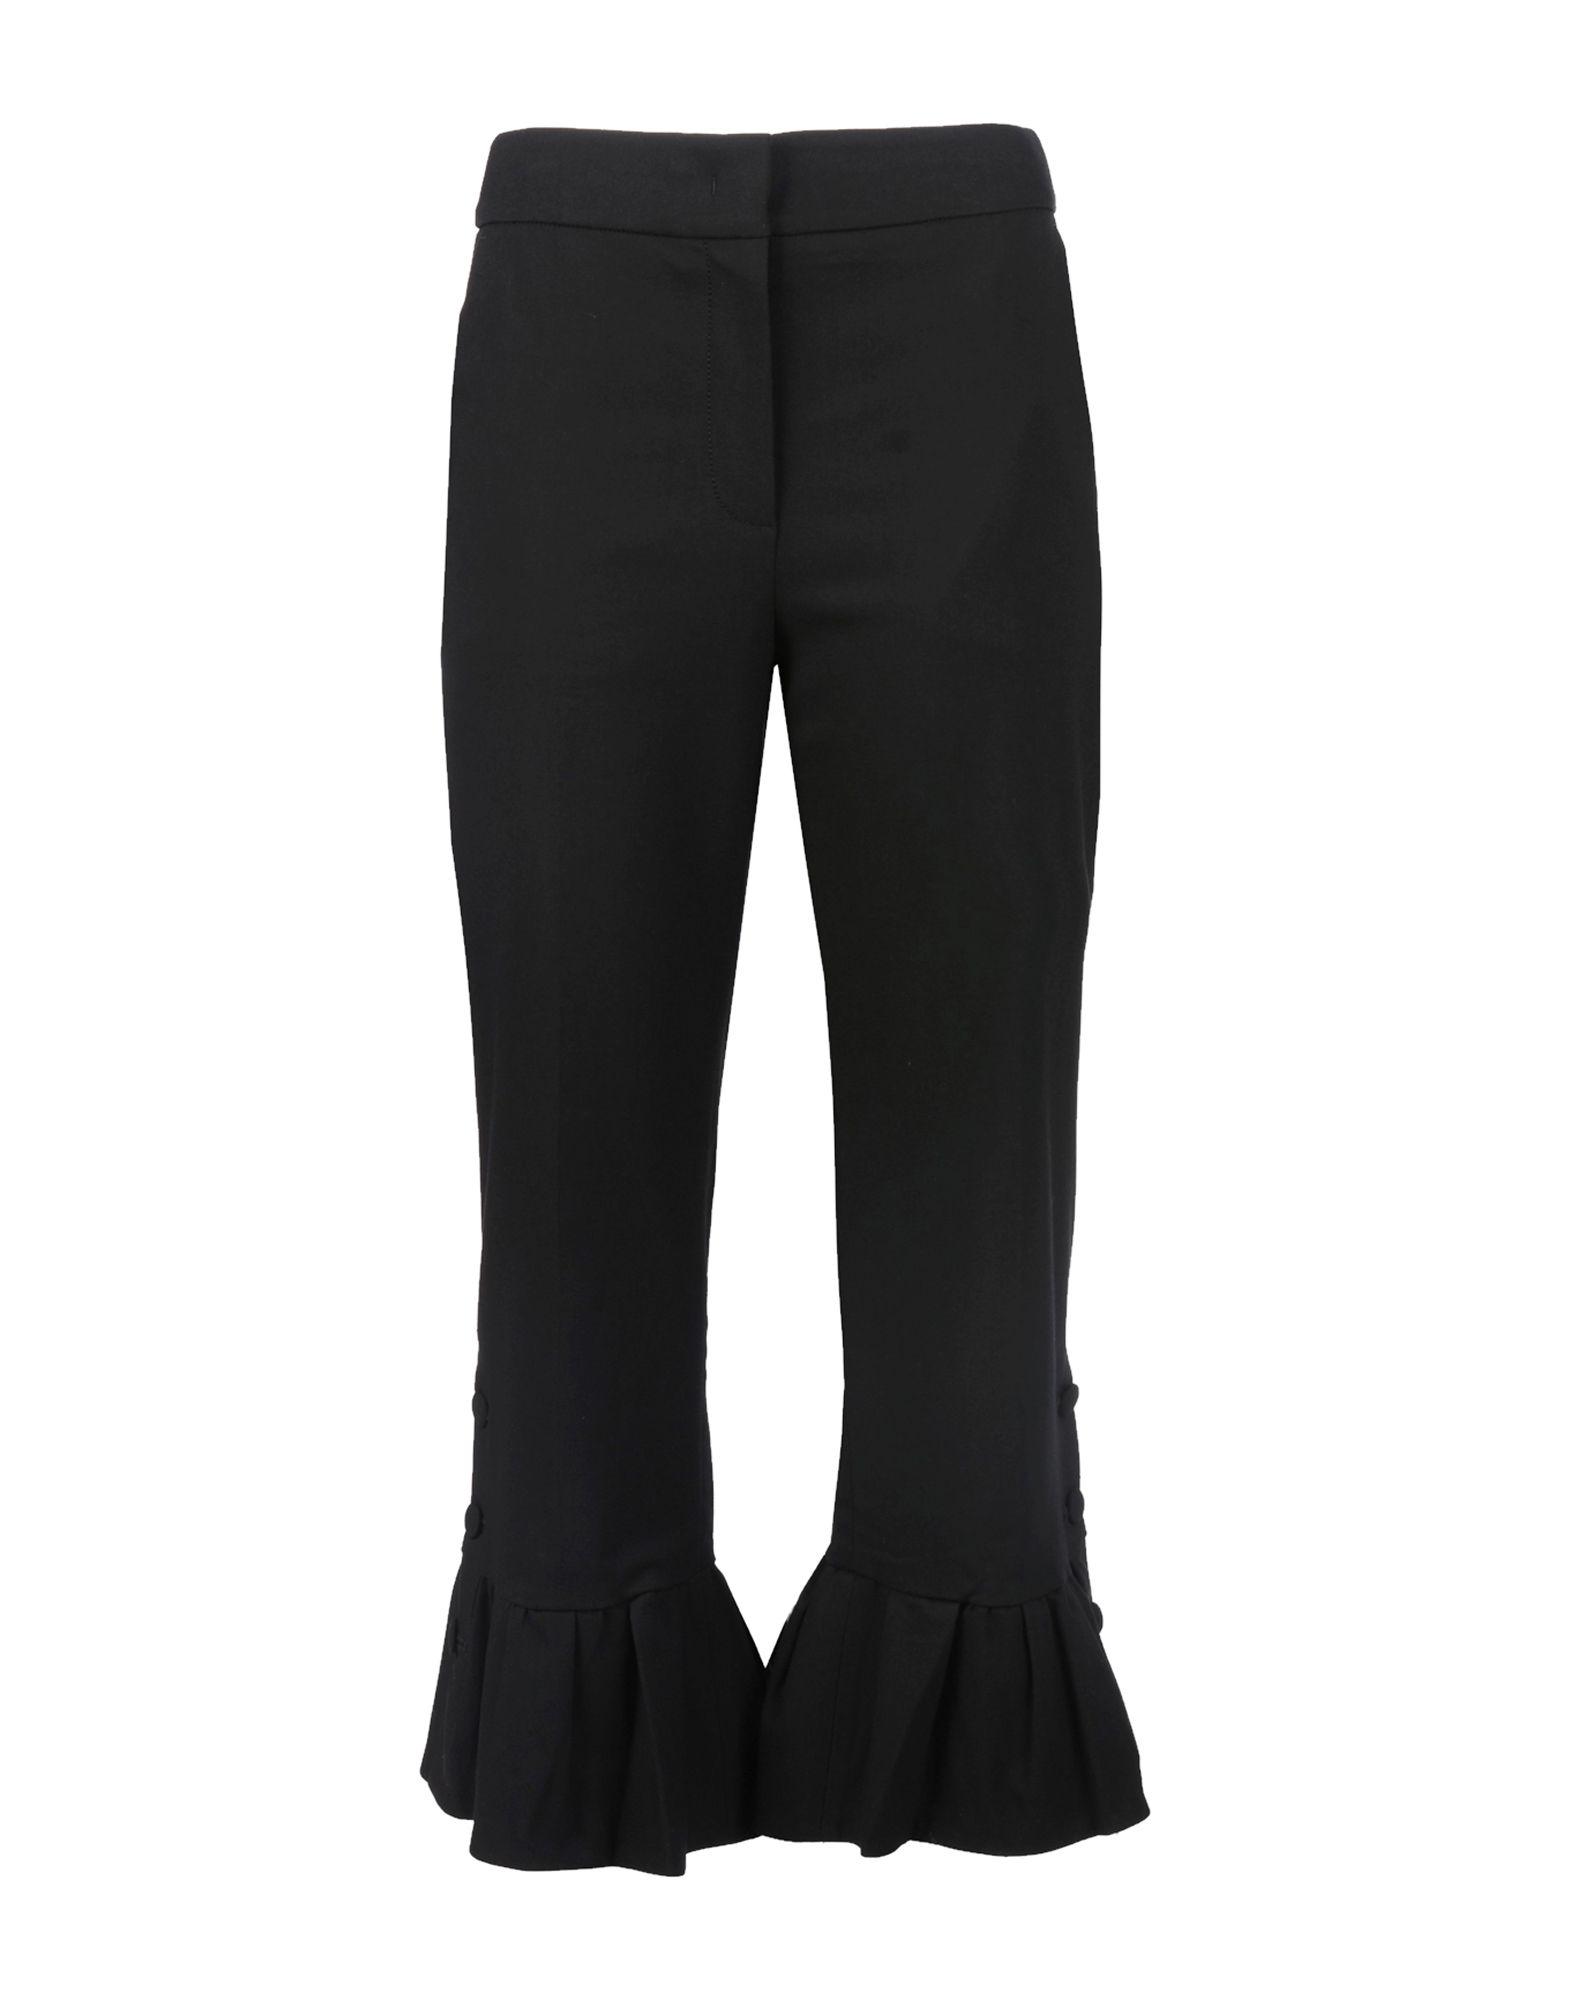 LUCKY CHOUETTE Повседневные брюки lucky chouette брючный комбинезон